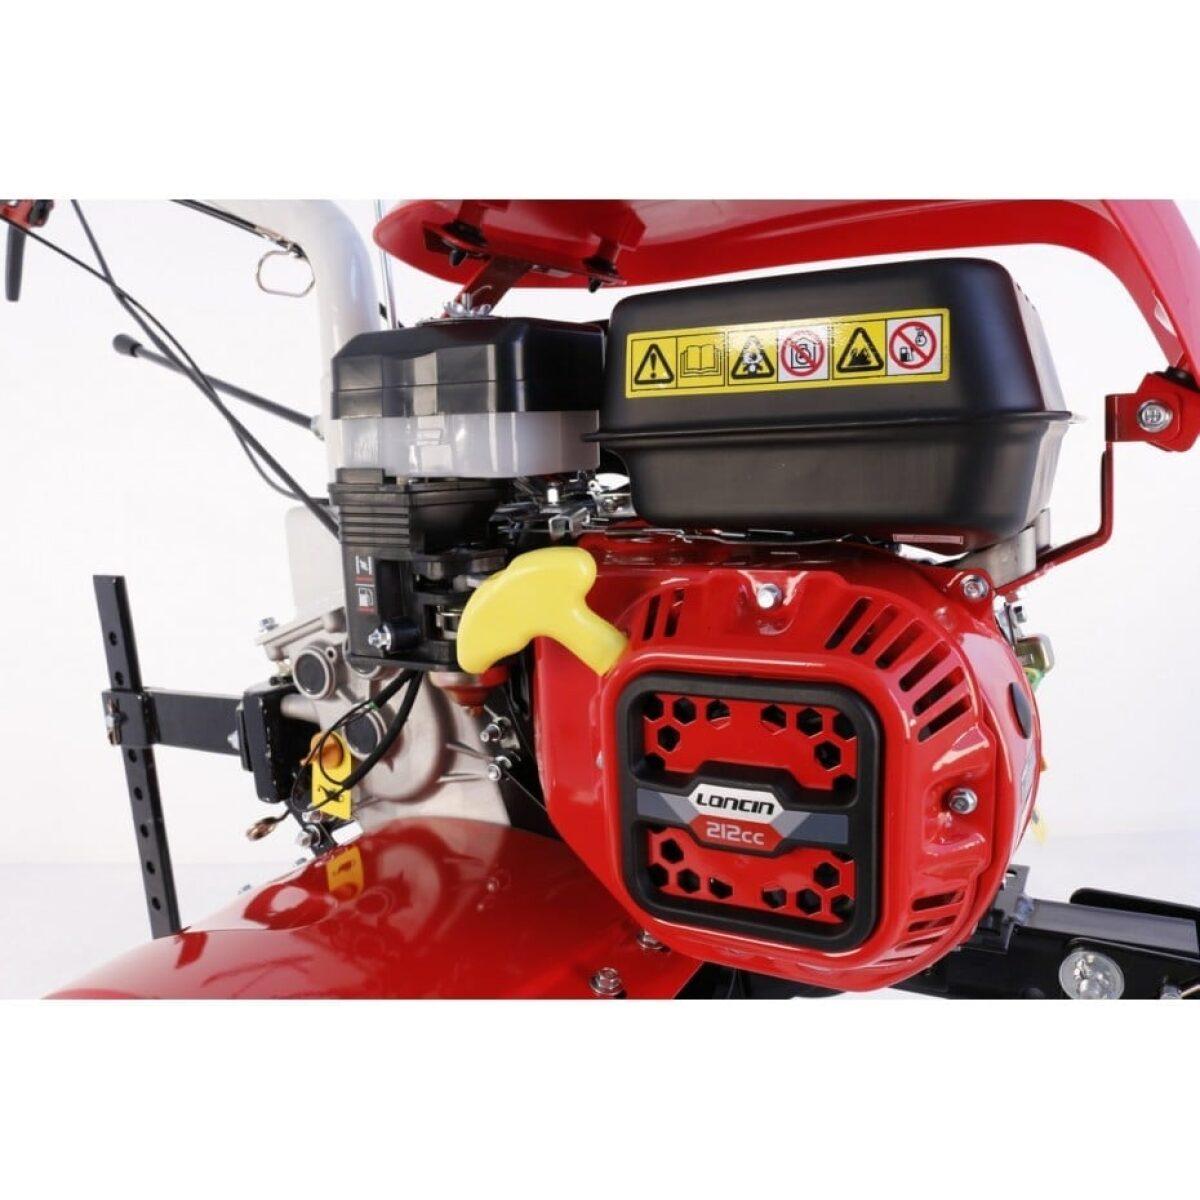 motocultor loncin lc750 7cp o mac.ro 8 38